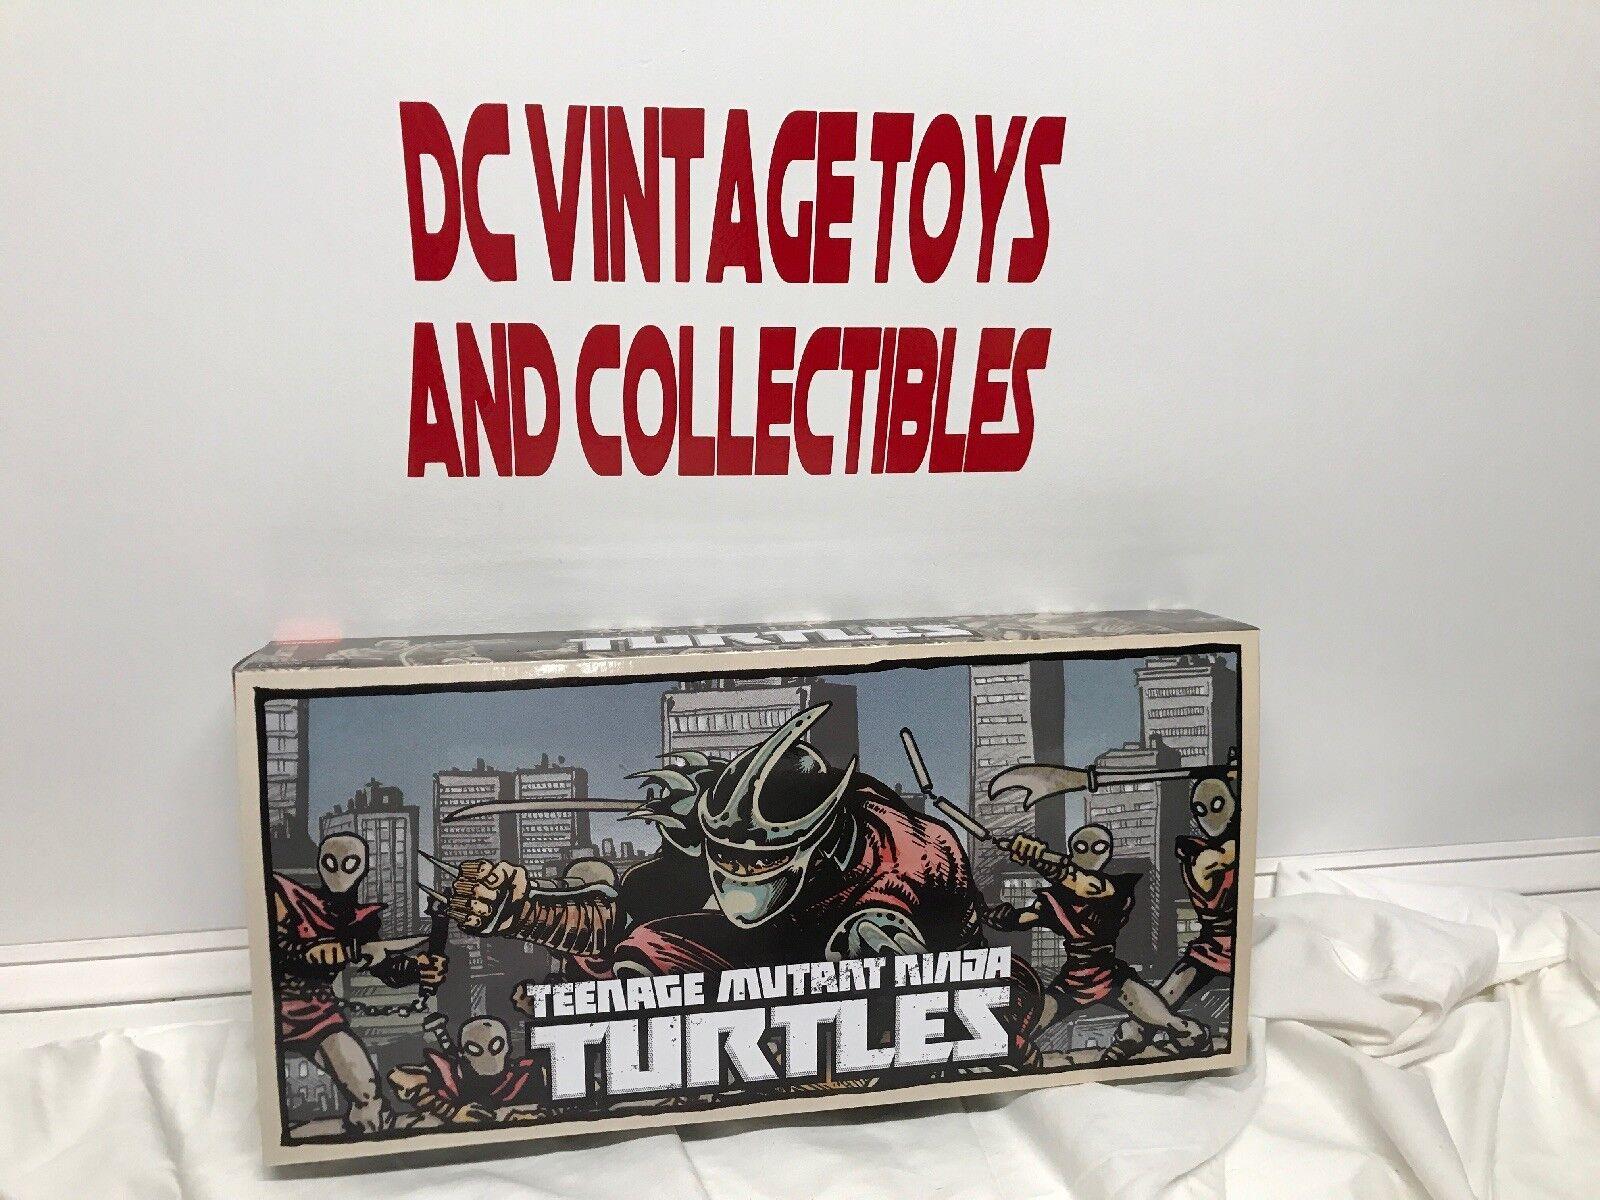 NECA pie clan New York Comic Con 2016 Teenage Mutant Ninja Turtles trituradora soldado Set